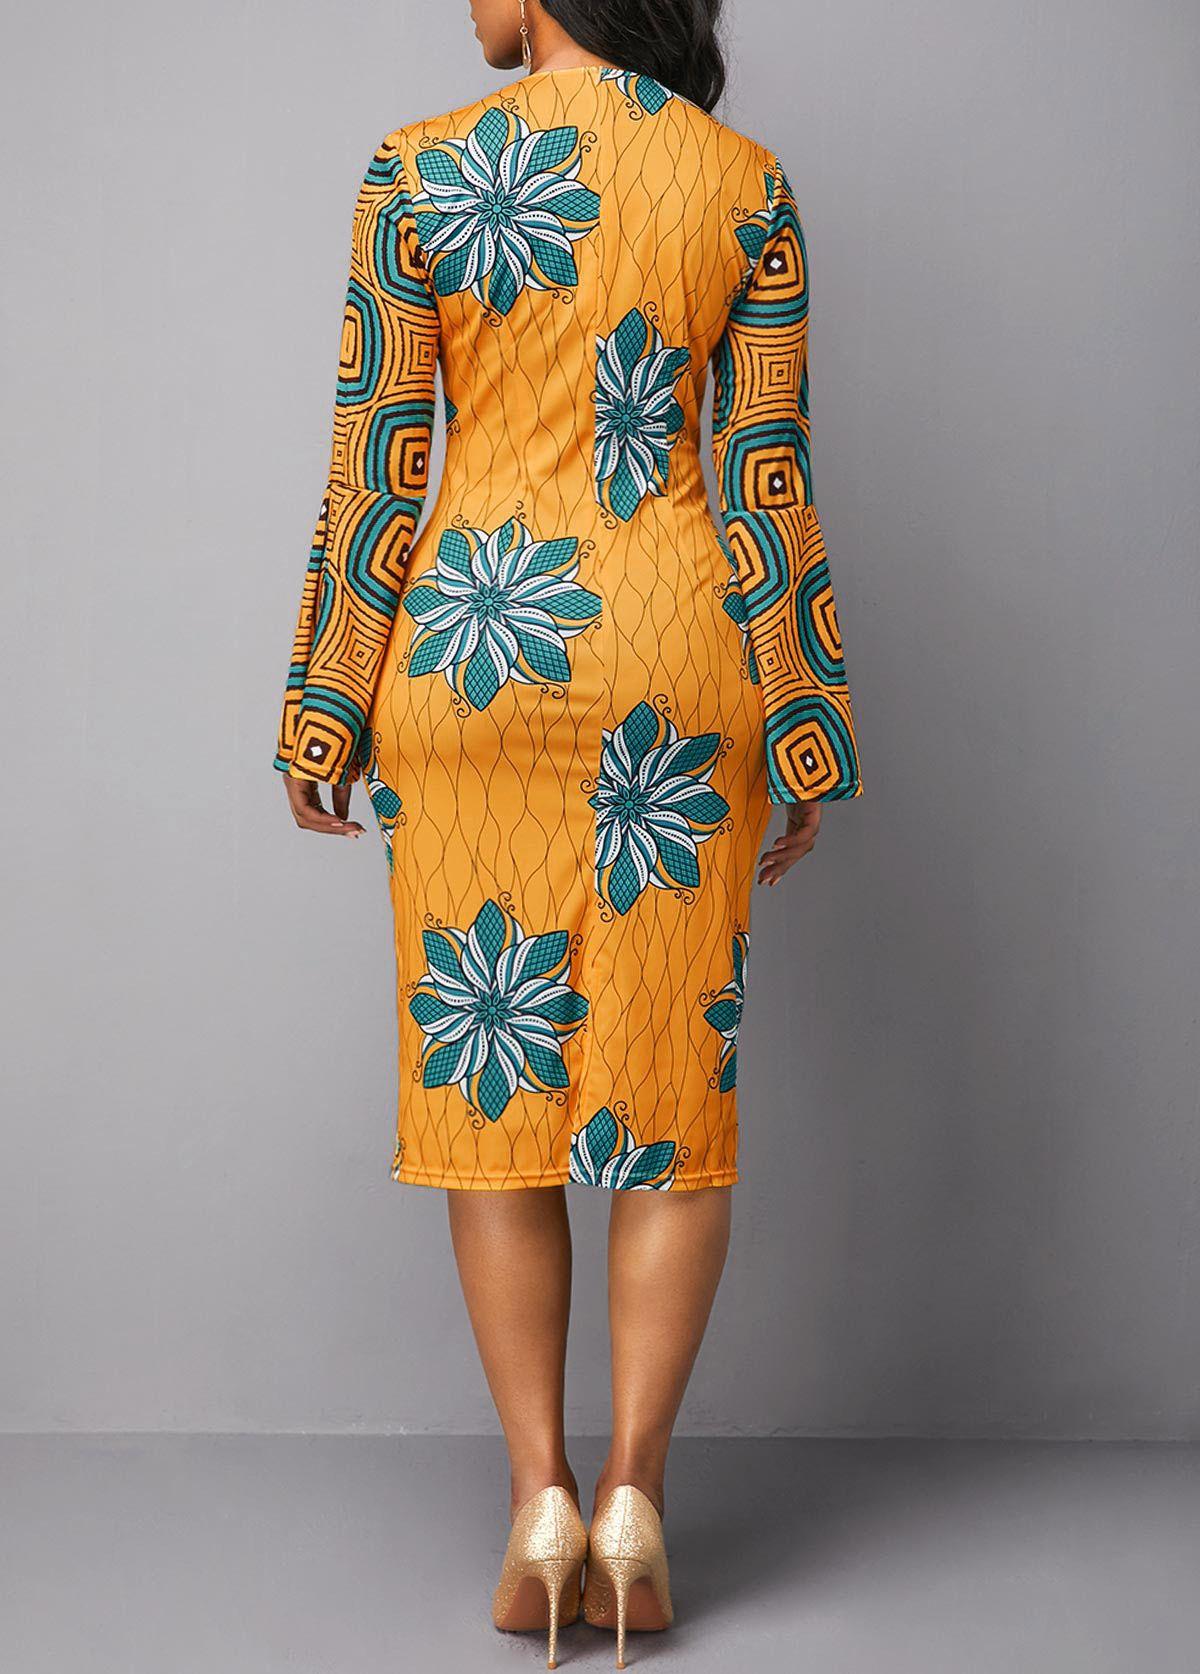 Flower Print Round Neck Flare Sleeve Yellow Dress  Rotita.com